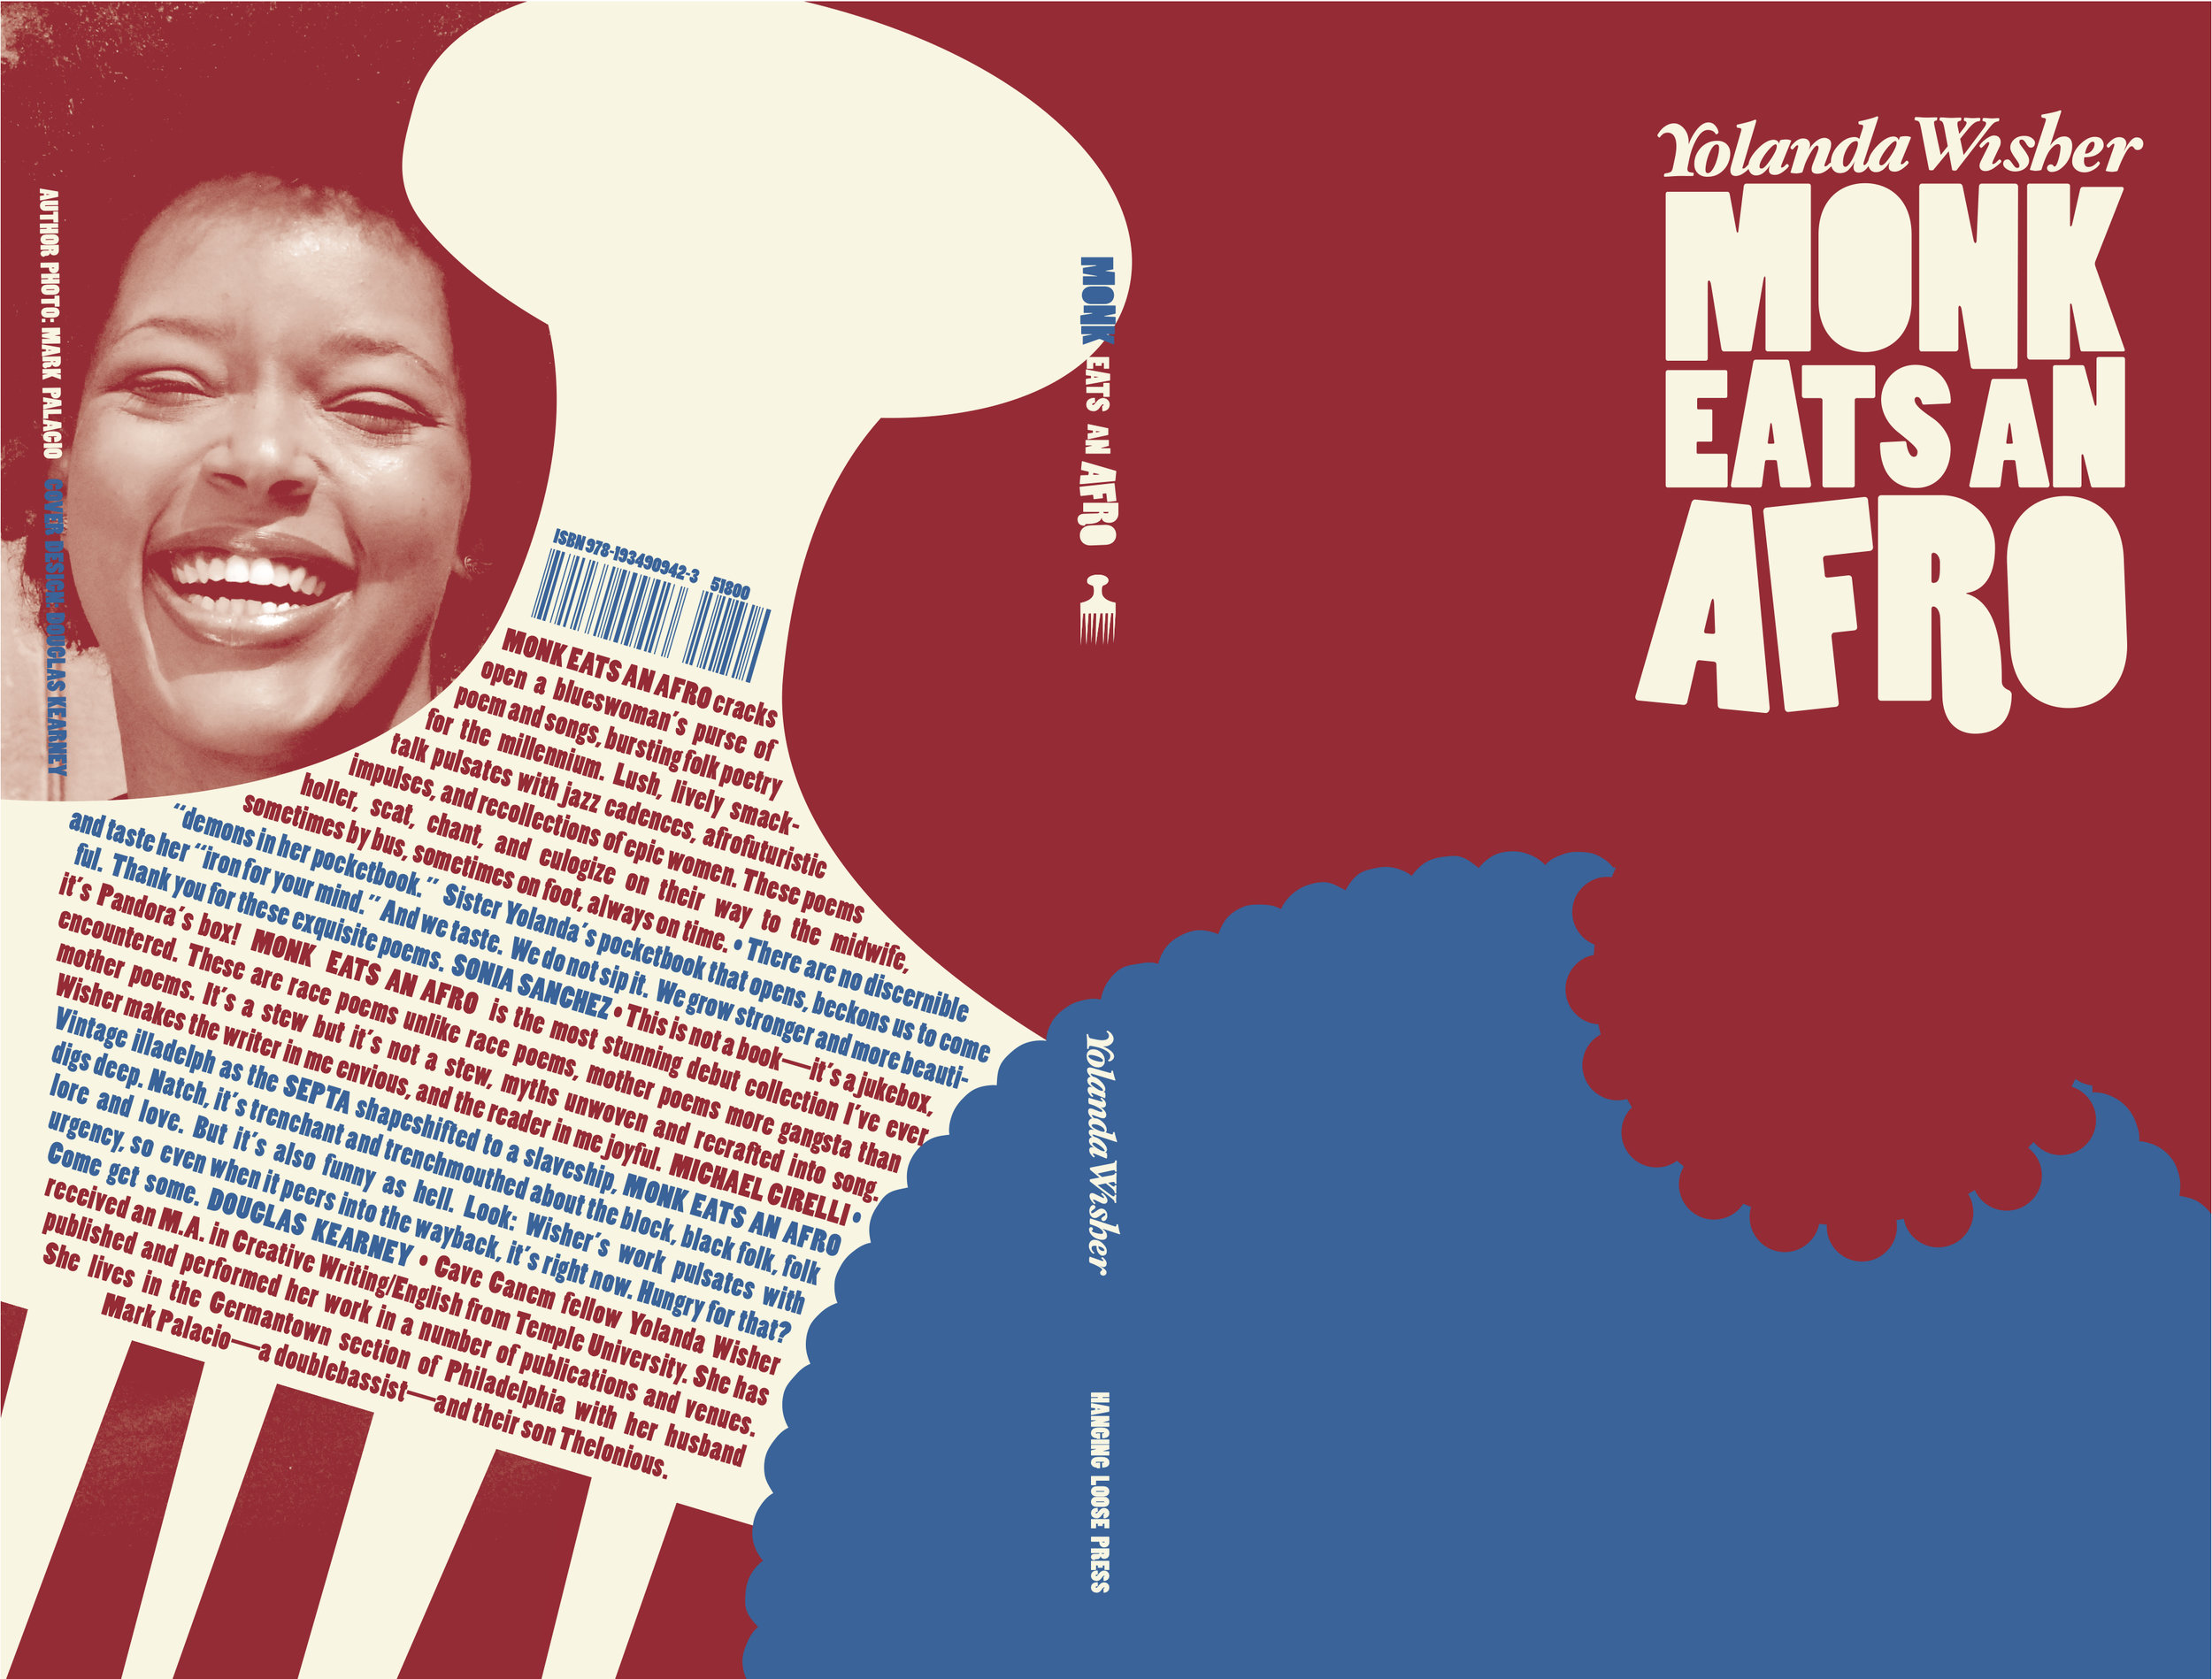 Cover design by Douglas Kearney, 2014.